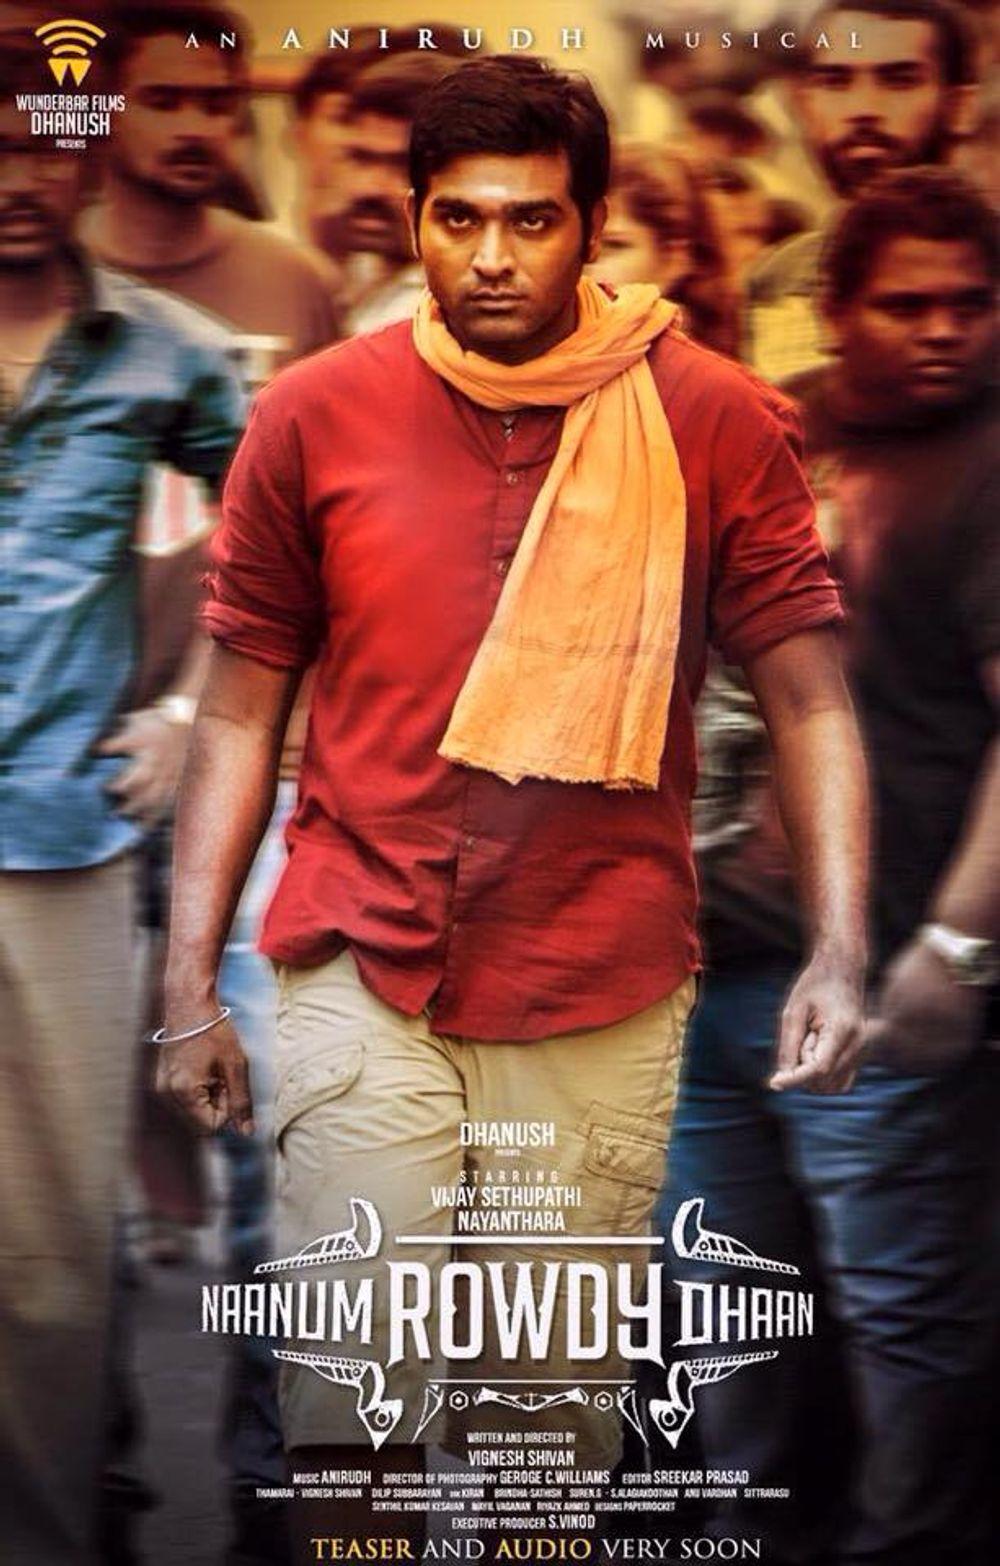 Naanum Rowdy Thaan (2020) Hindi Dubbed Movie 720p HDRip AAC